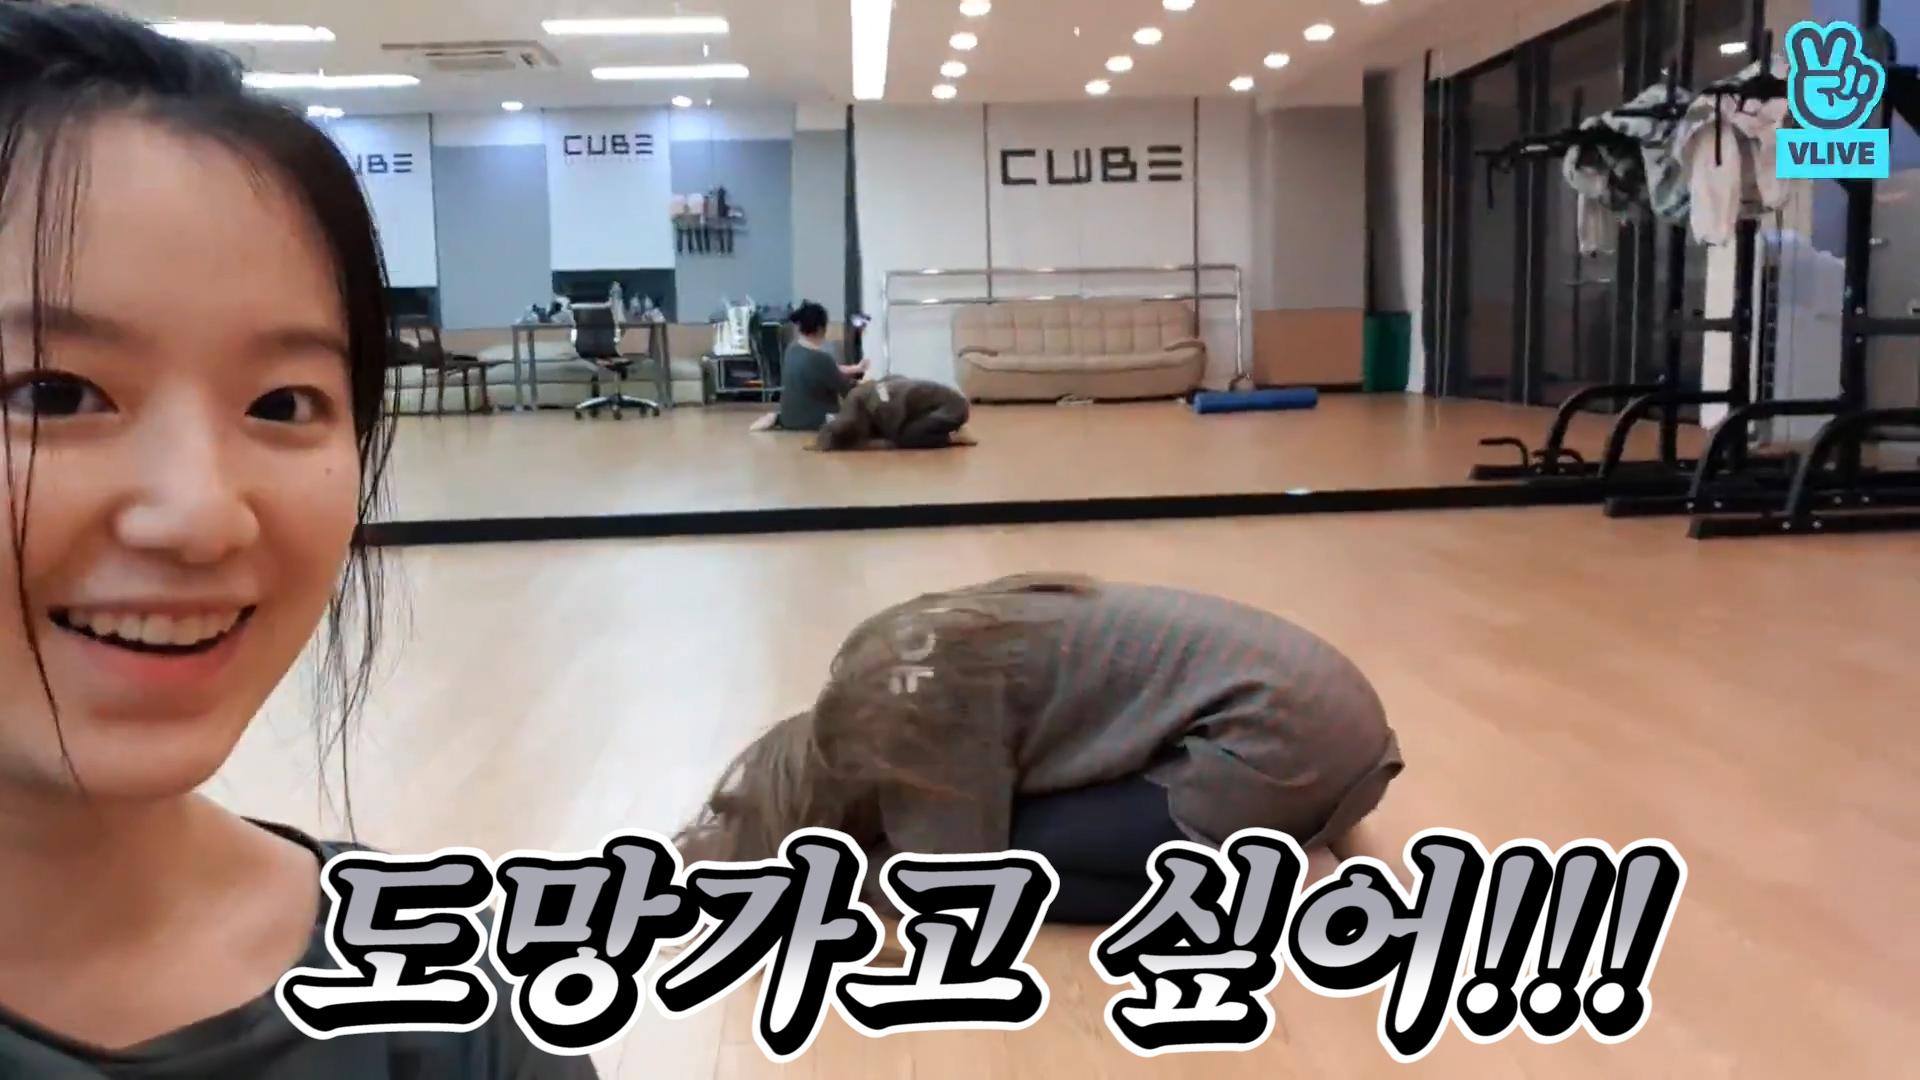 [(G)I-DLE] 텐션 완전 연습실 찢었고.. 너무 귀여워서 난 심장 찢어지고..💗 (SHUHUA changing SOOJIN's hairstyle)